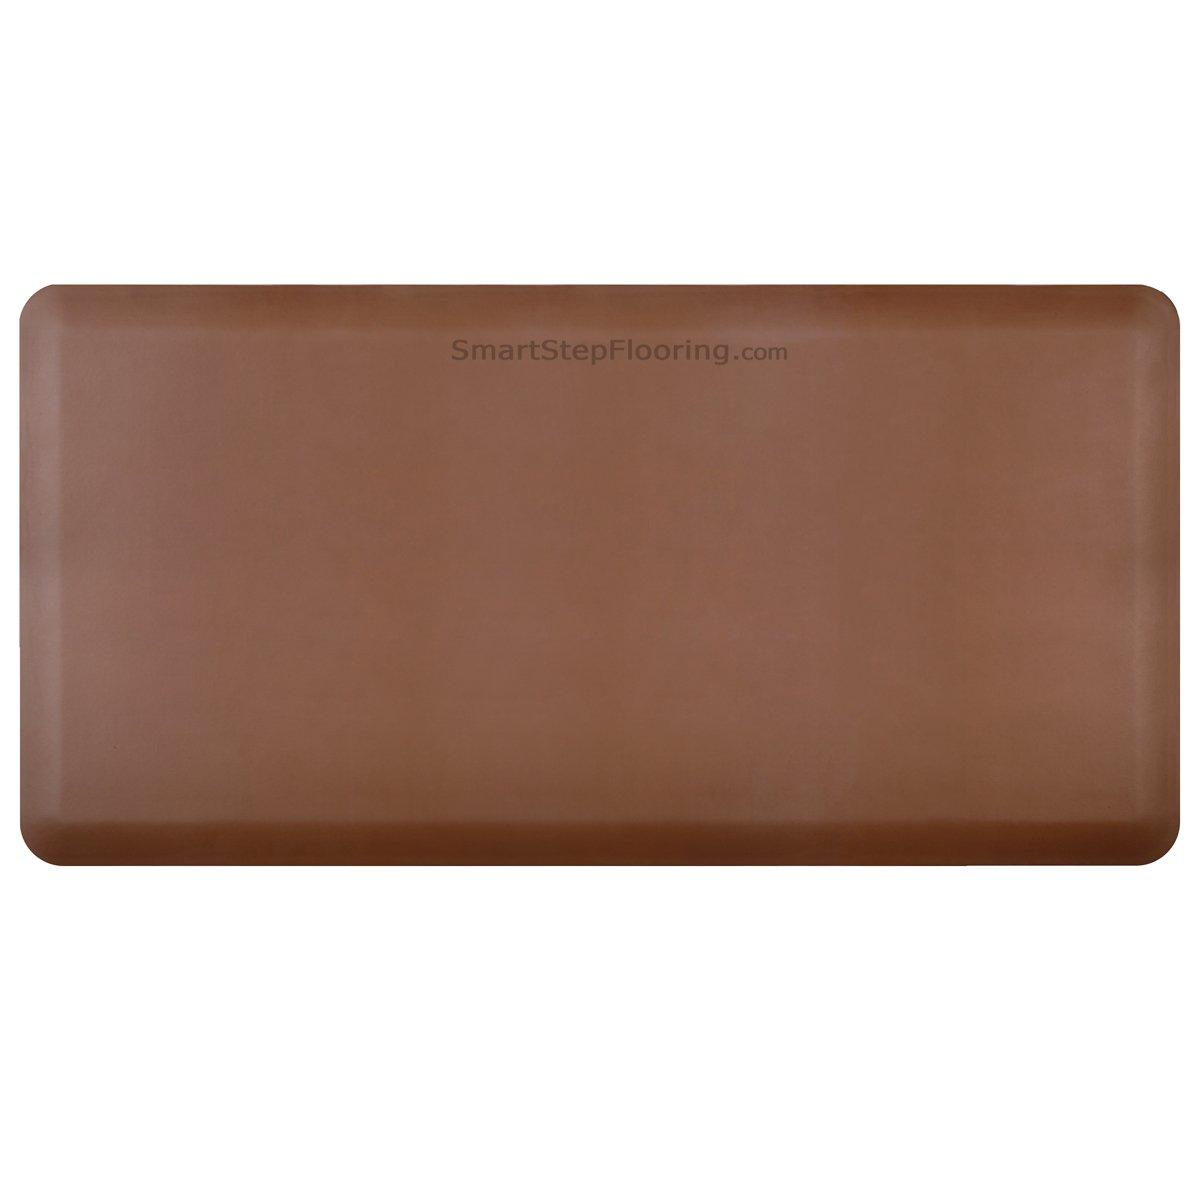 Smart Step Designer Anti-Fatigue Polyurethane Mat, 36'' Length x 20'' Width x 5/8'' Thick, Brown